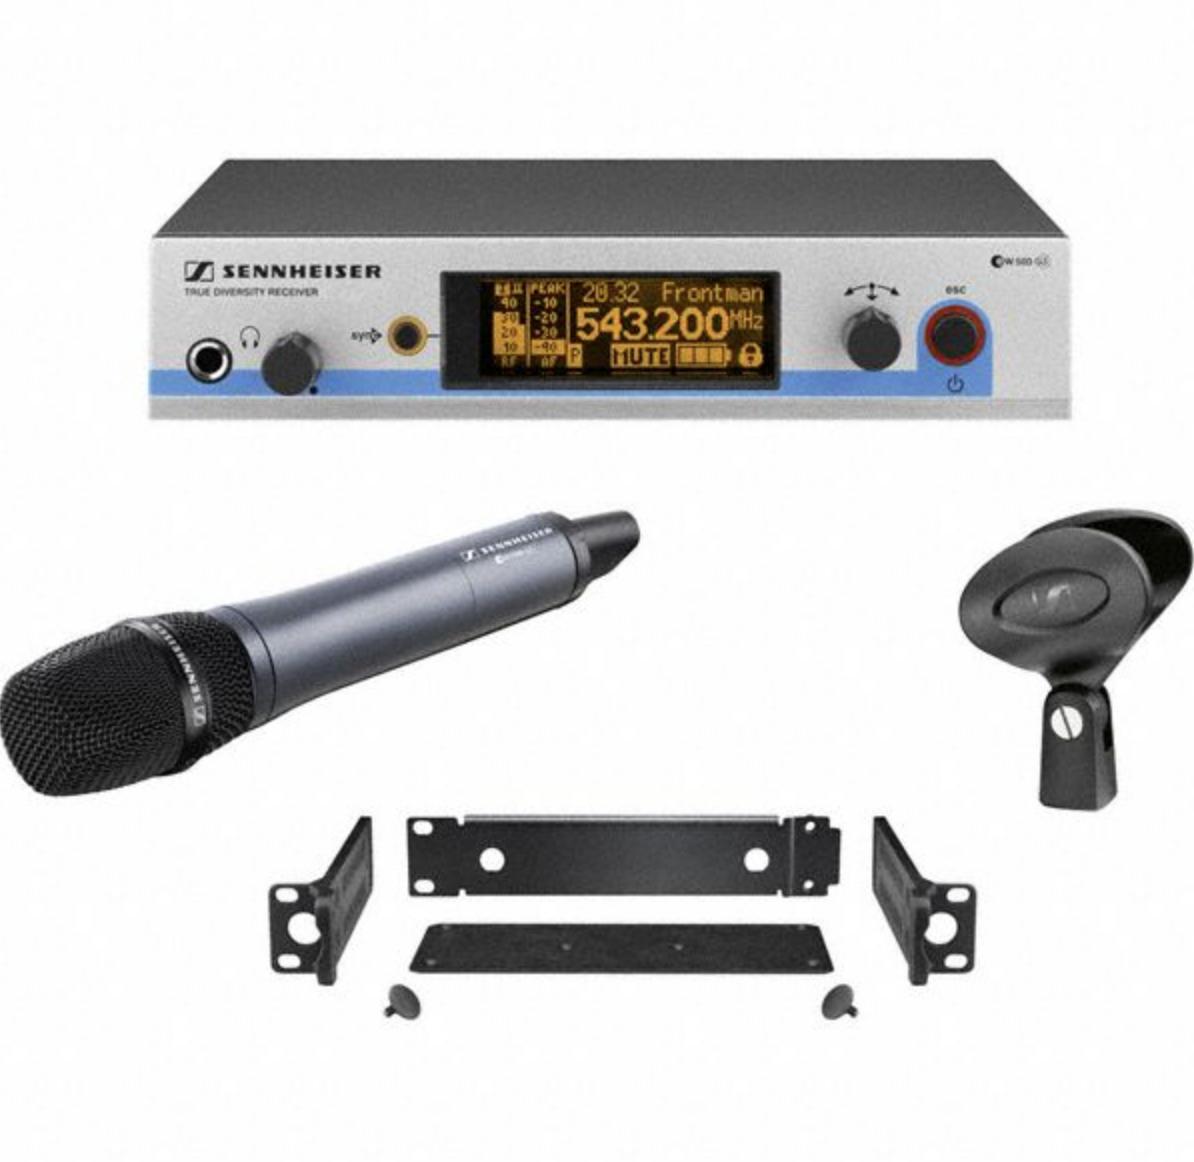 ew 572 G3 A-X - Ensemble de poche: EM 500, SK 500, CI 1 et GA 3, 516-558 MHz